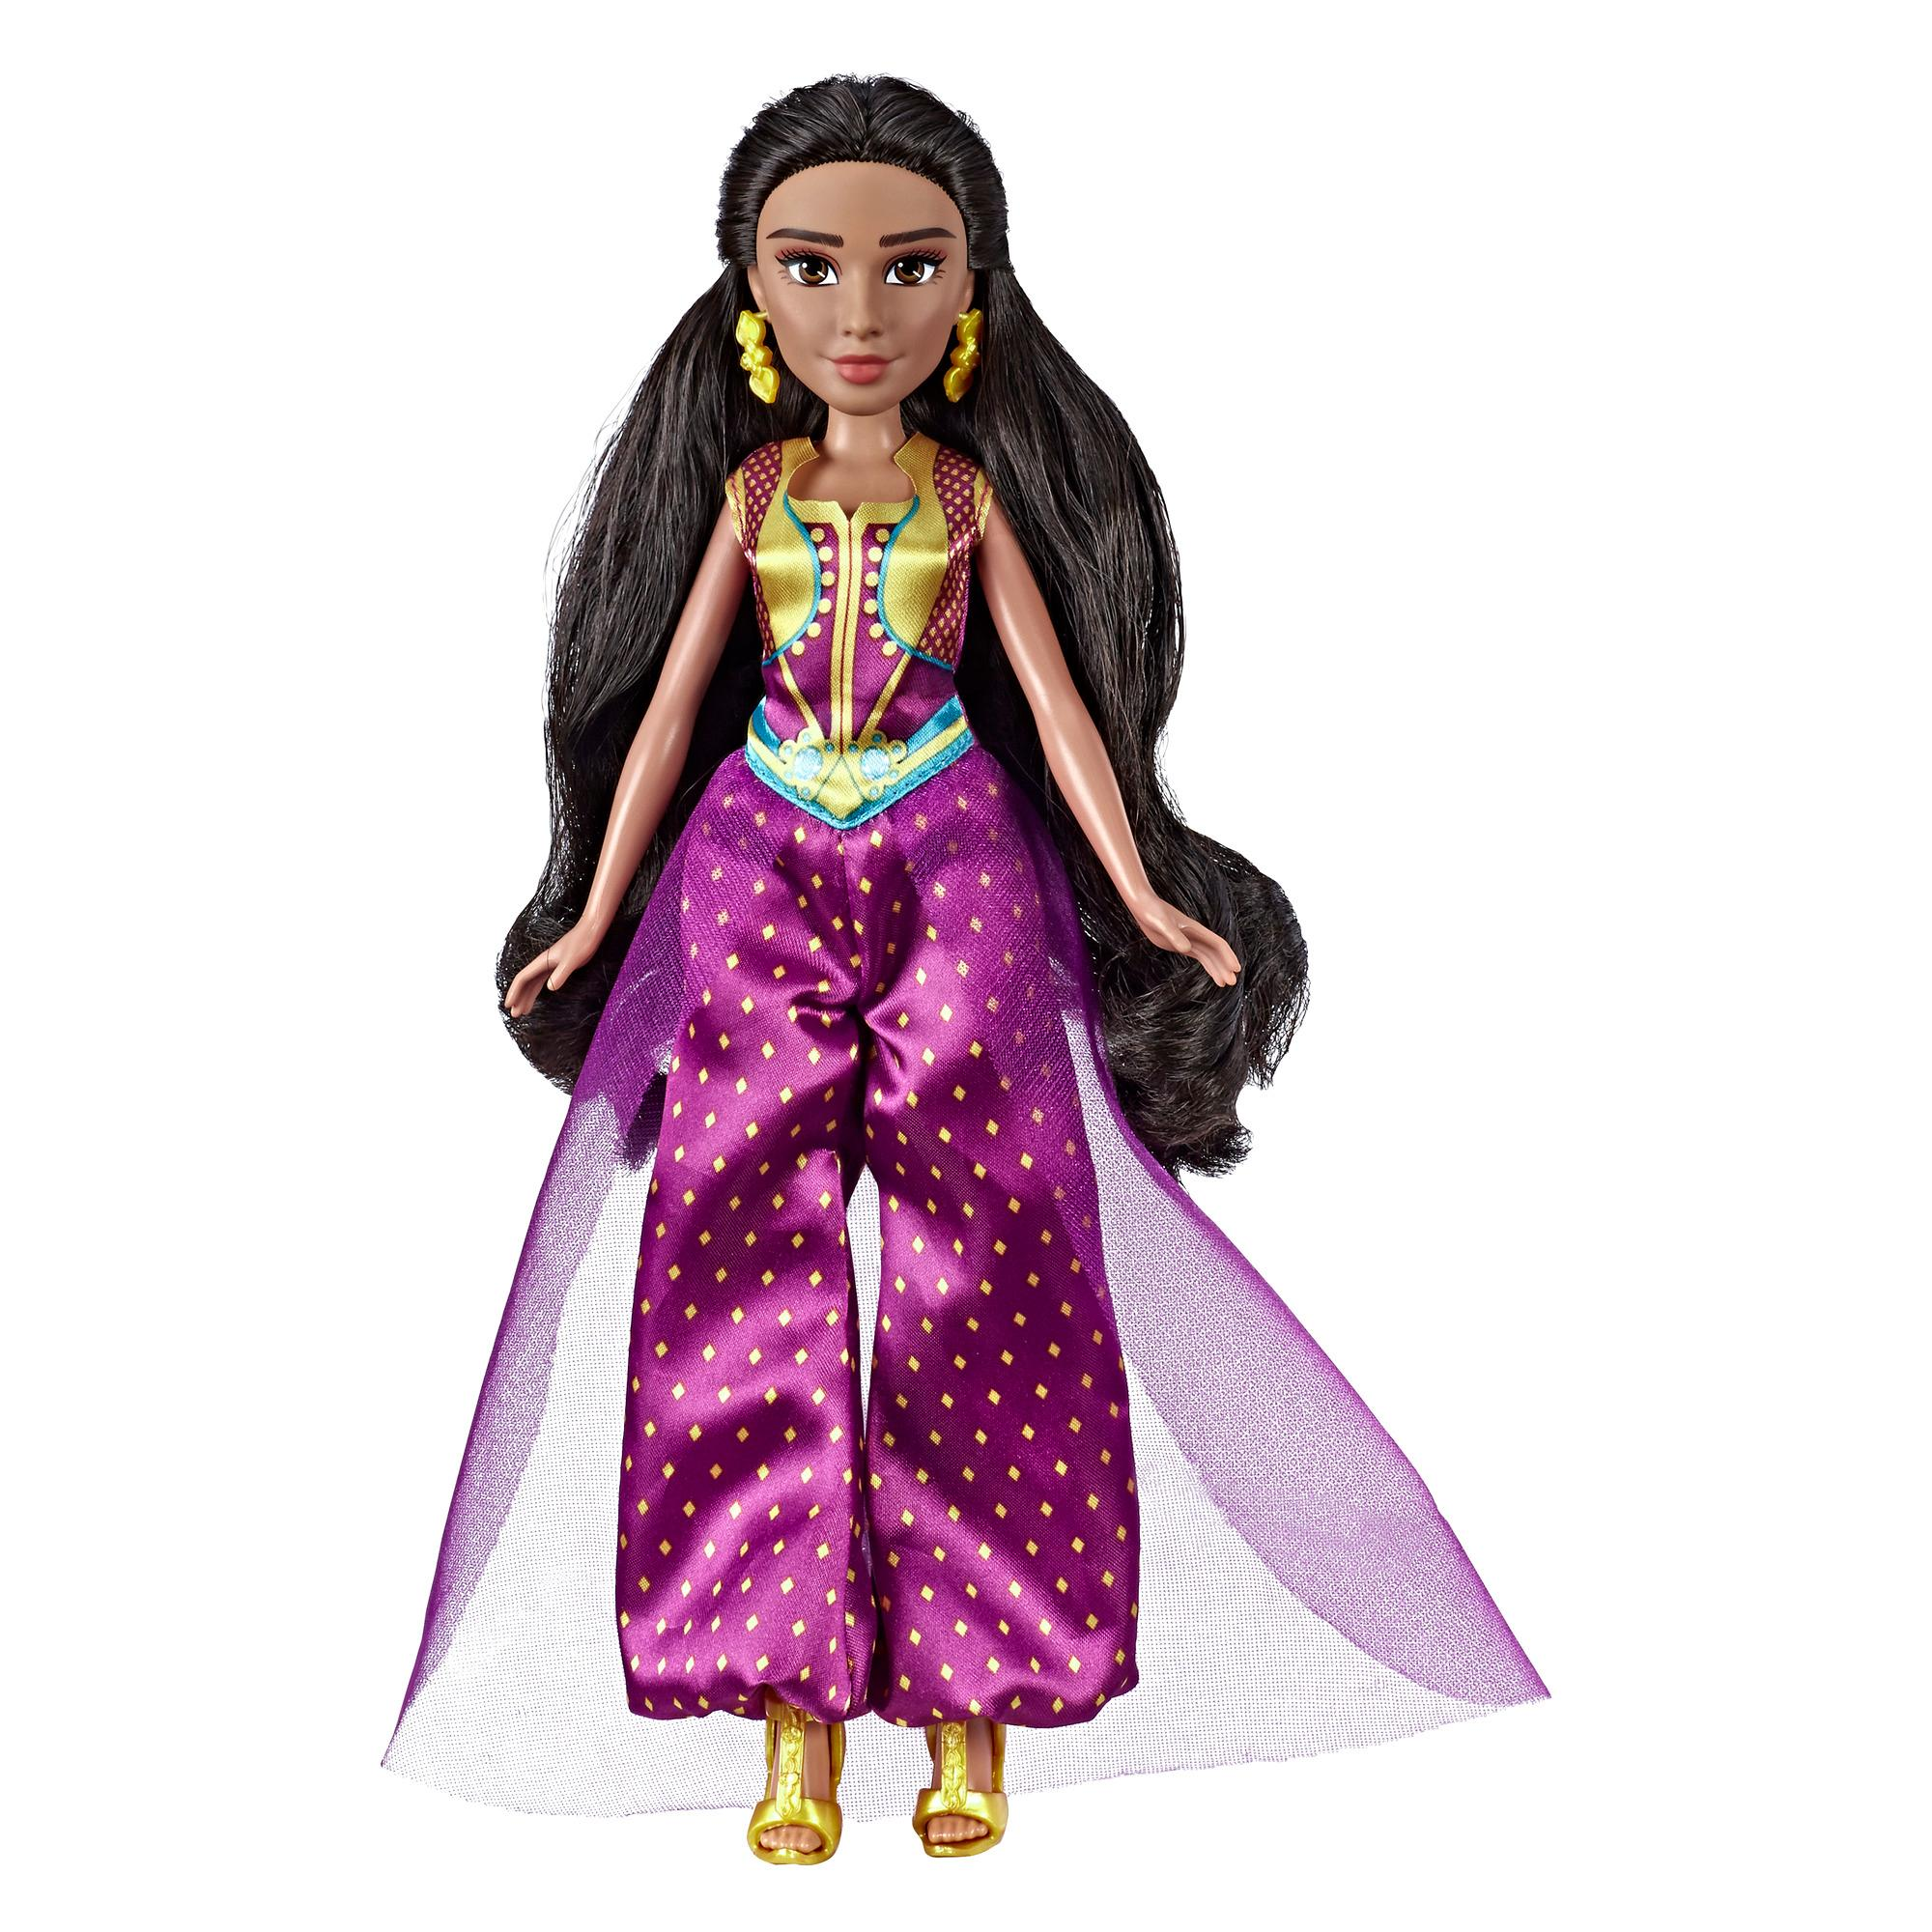 Disney Princess Jasmine Deluxe Fashion Doll